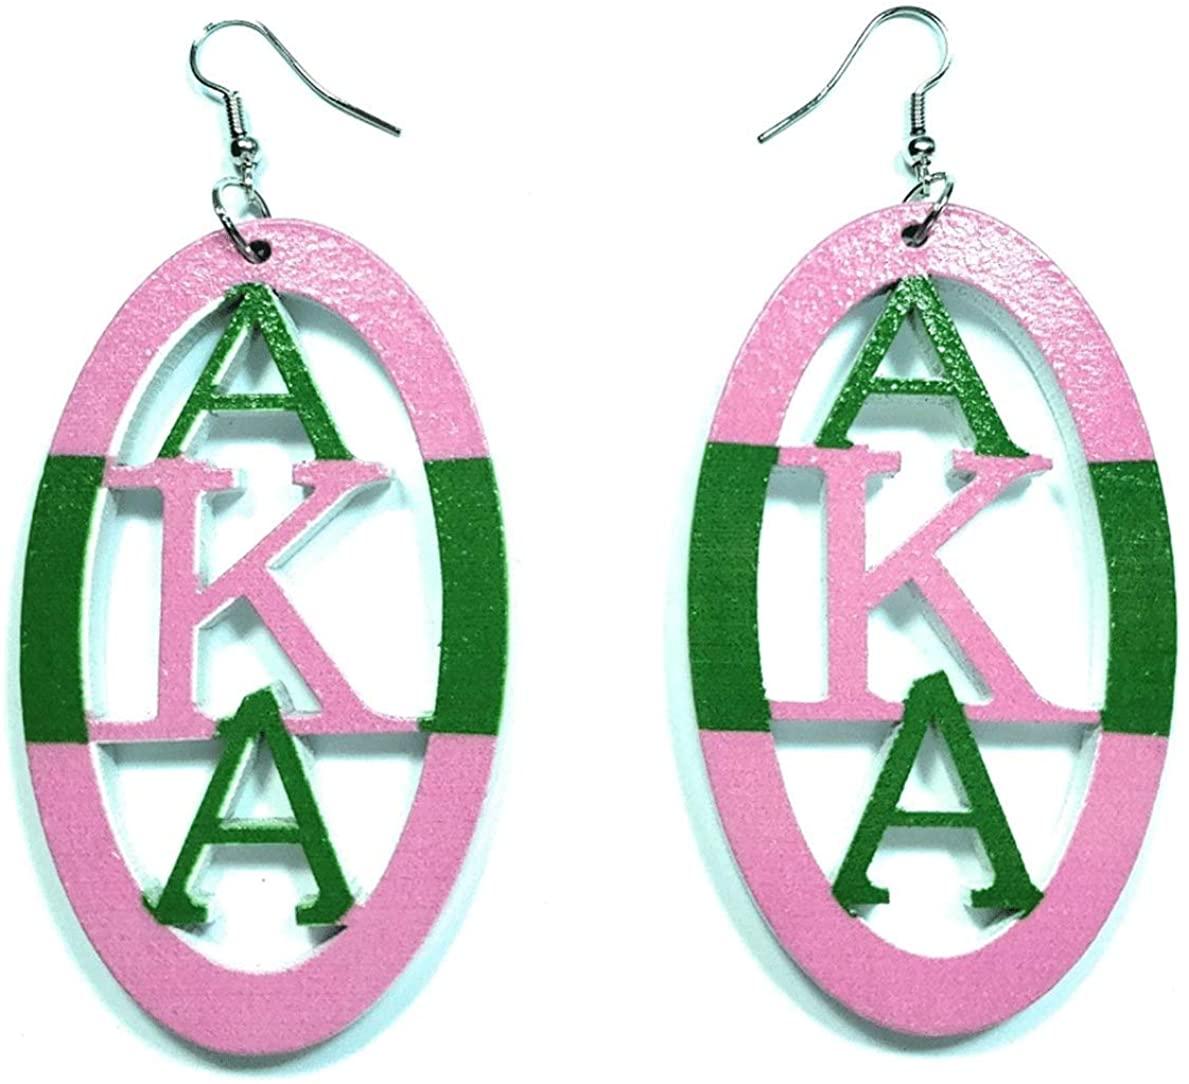 AKA Sorority Alpha Kappa Alpha Pink Green Black Women Girls Fashion Jewelry Paraphernalia Dangle Earrings